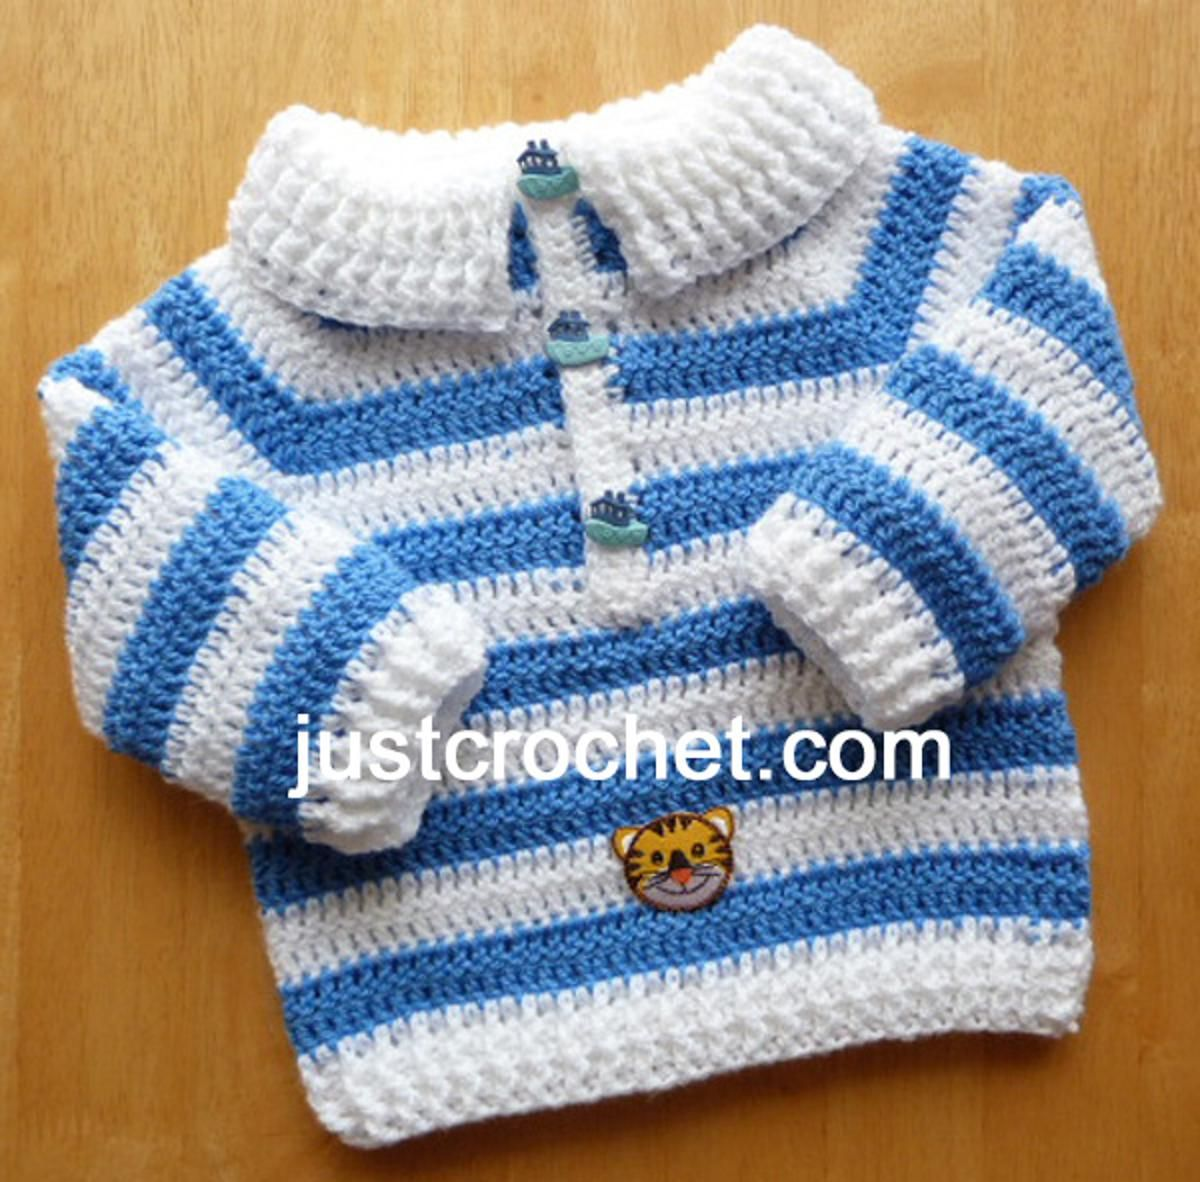 fjc122-Collared Sweater Baby Crochet Pattern   Craftsy   Crochet ...